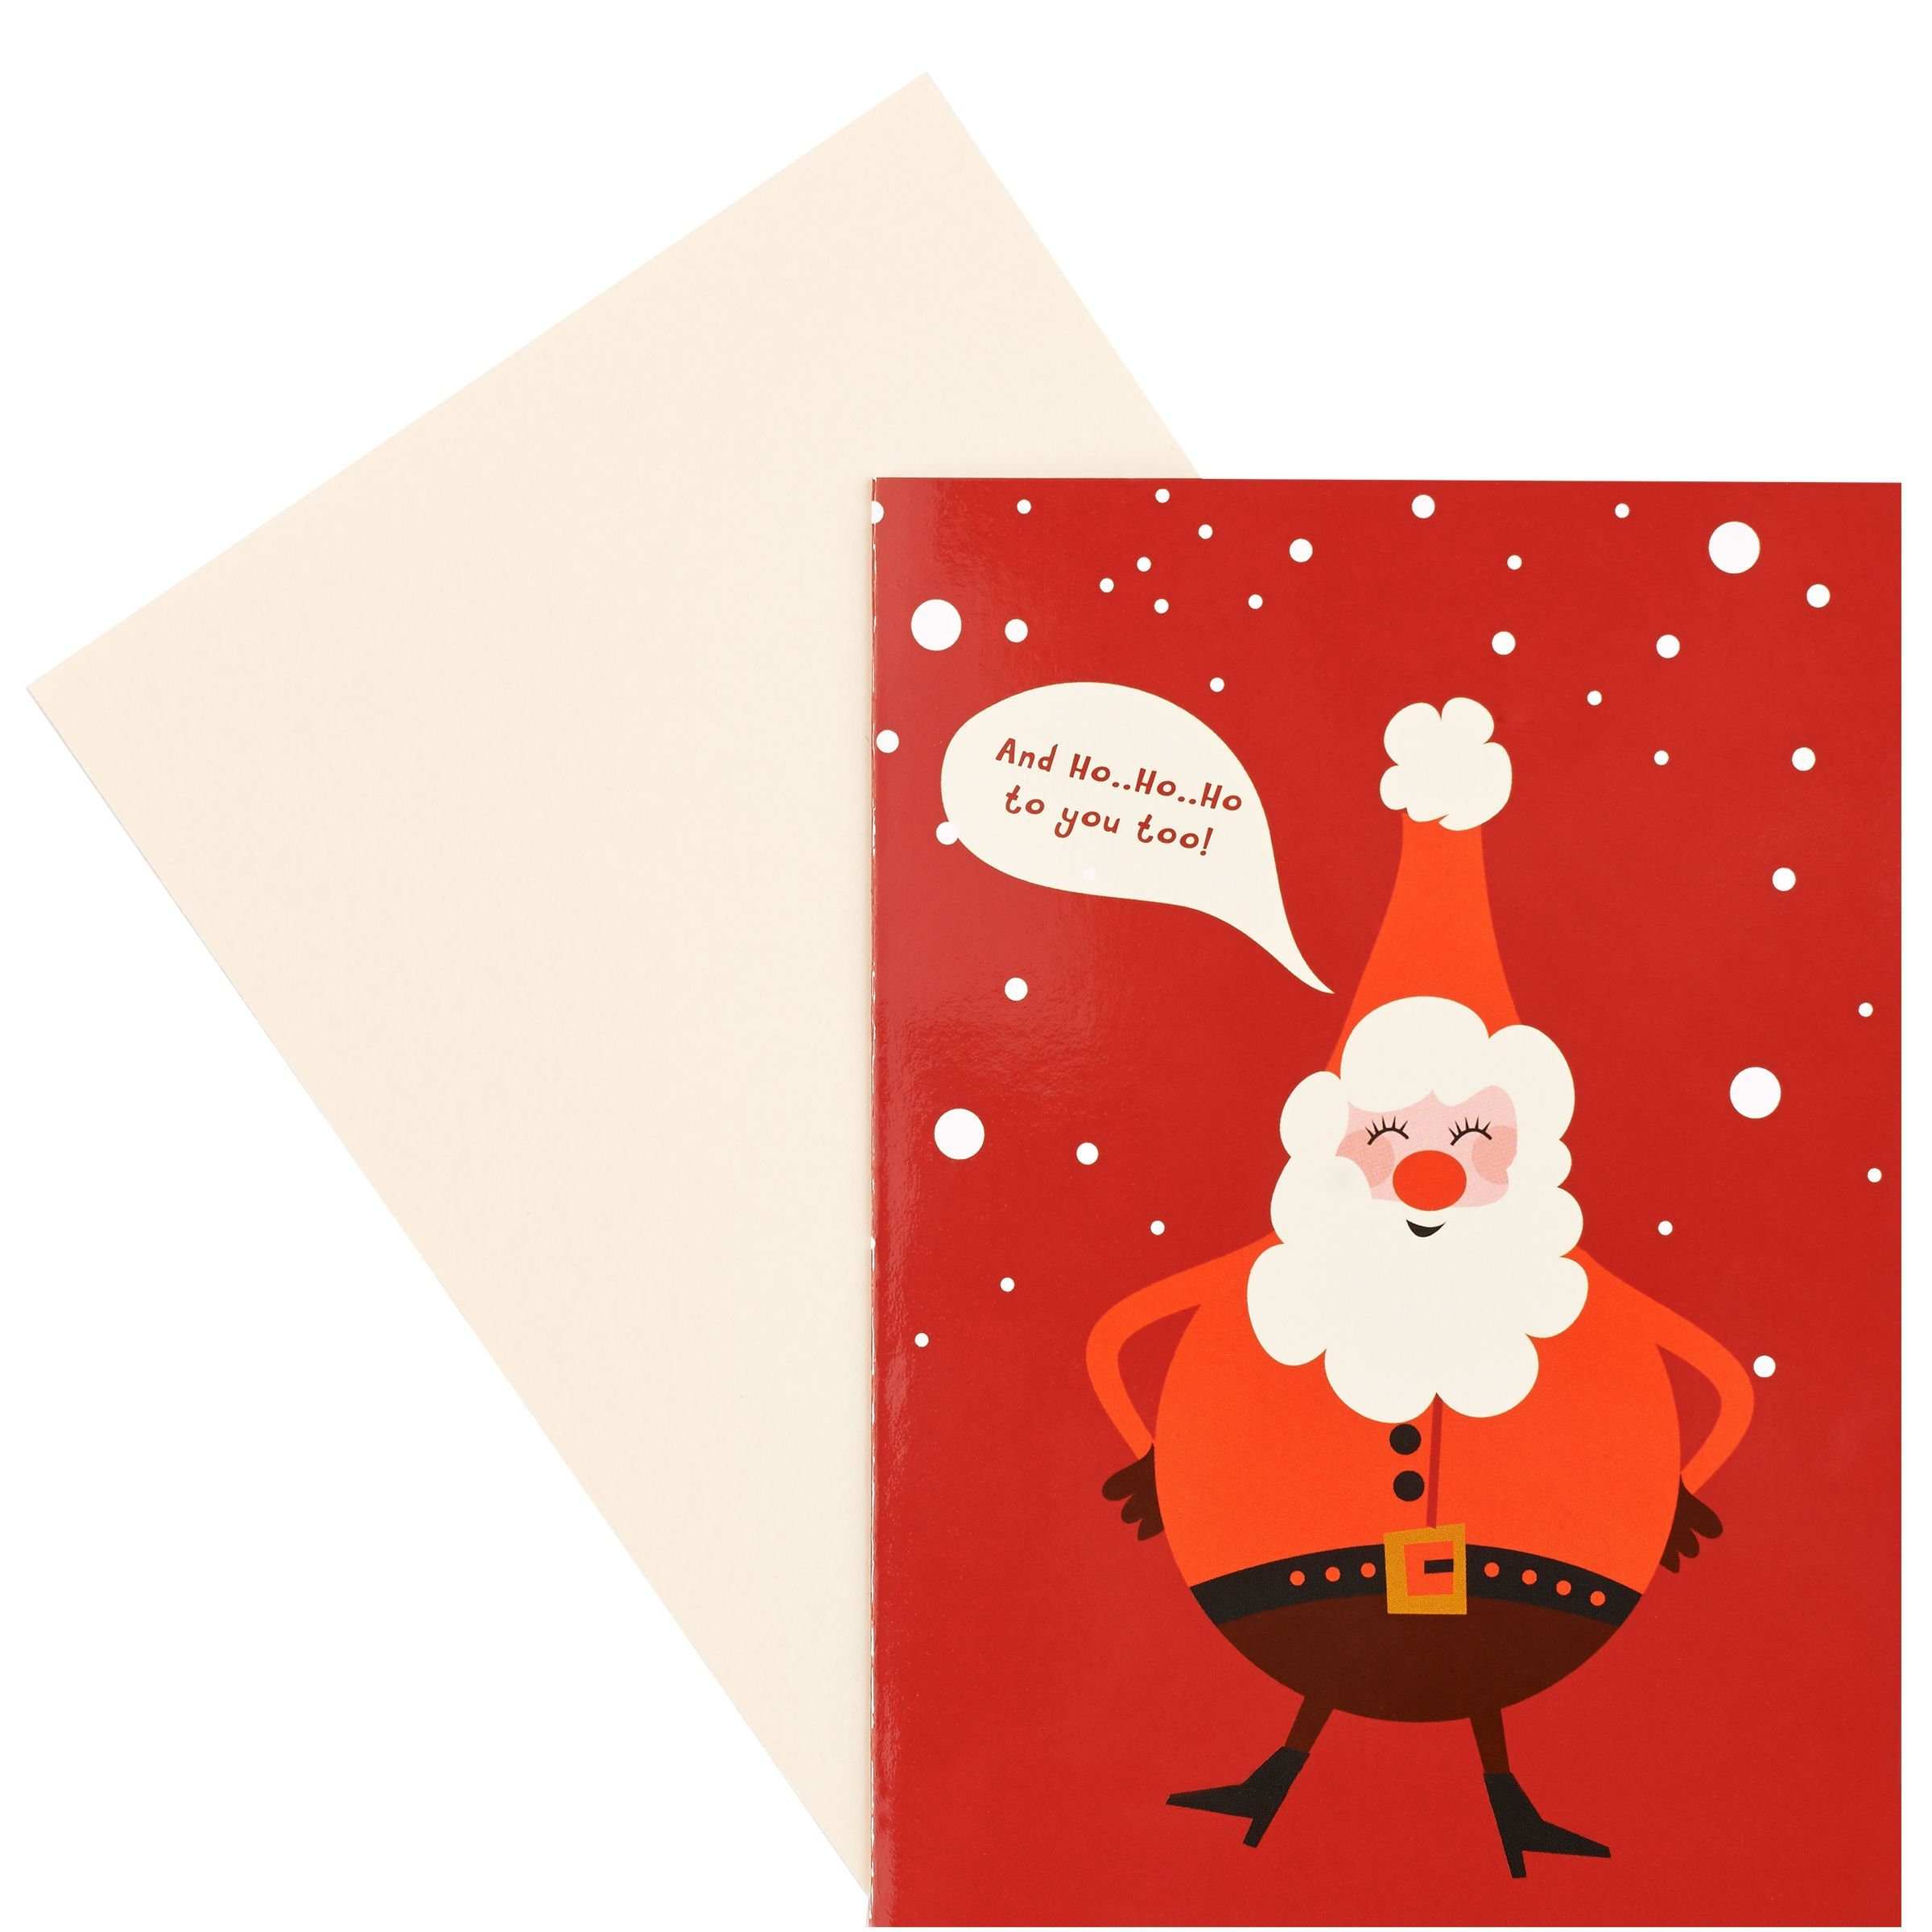 BUTLERS CARD »HoHoHo to you«